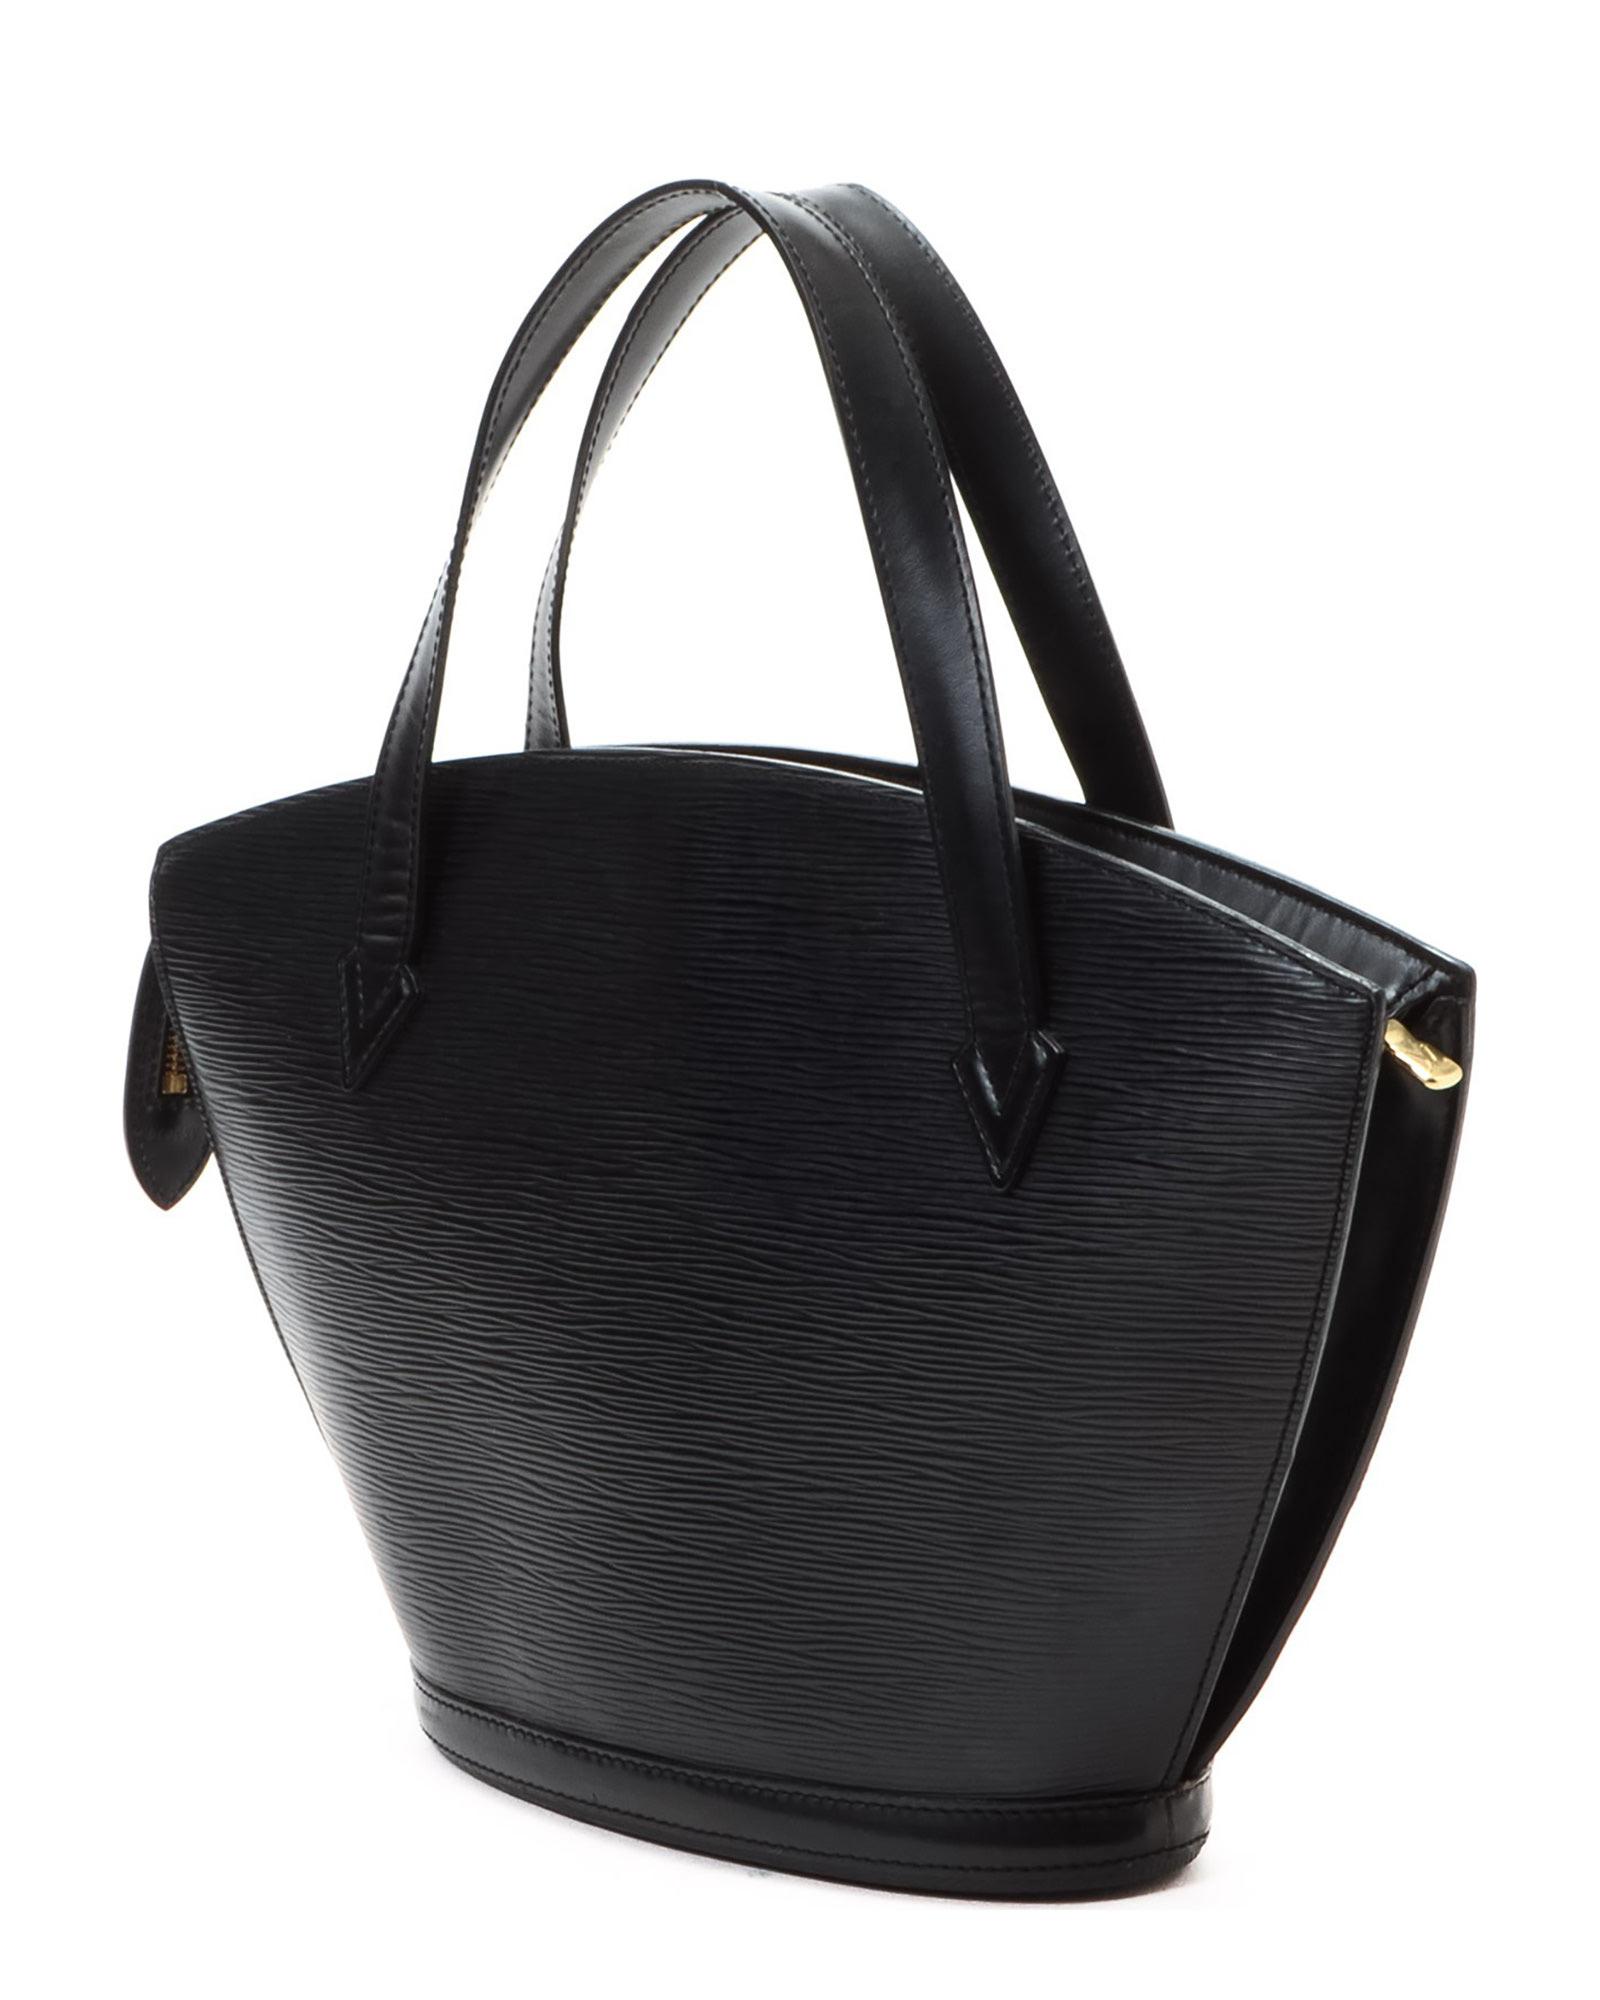 fe614497669e Black Louis Vuitton Handbag - Wallpaper About Handbag and Furniture